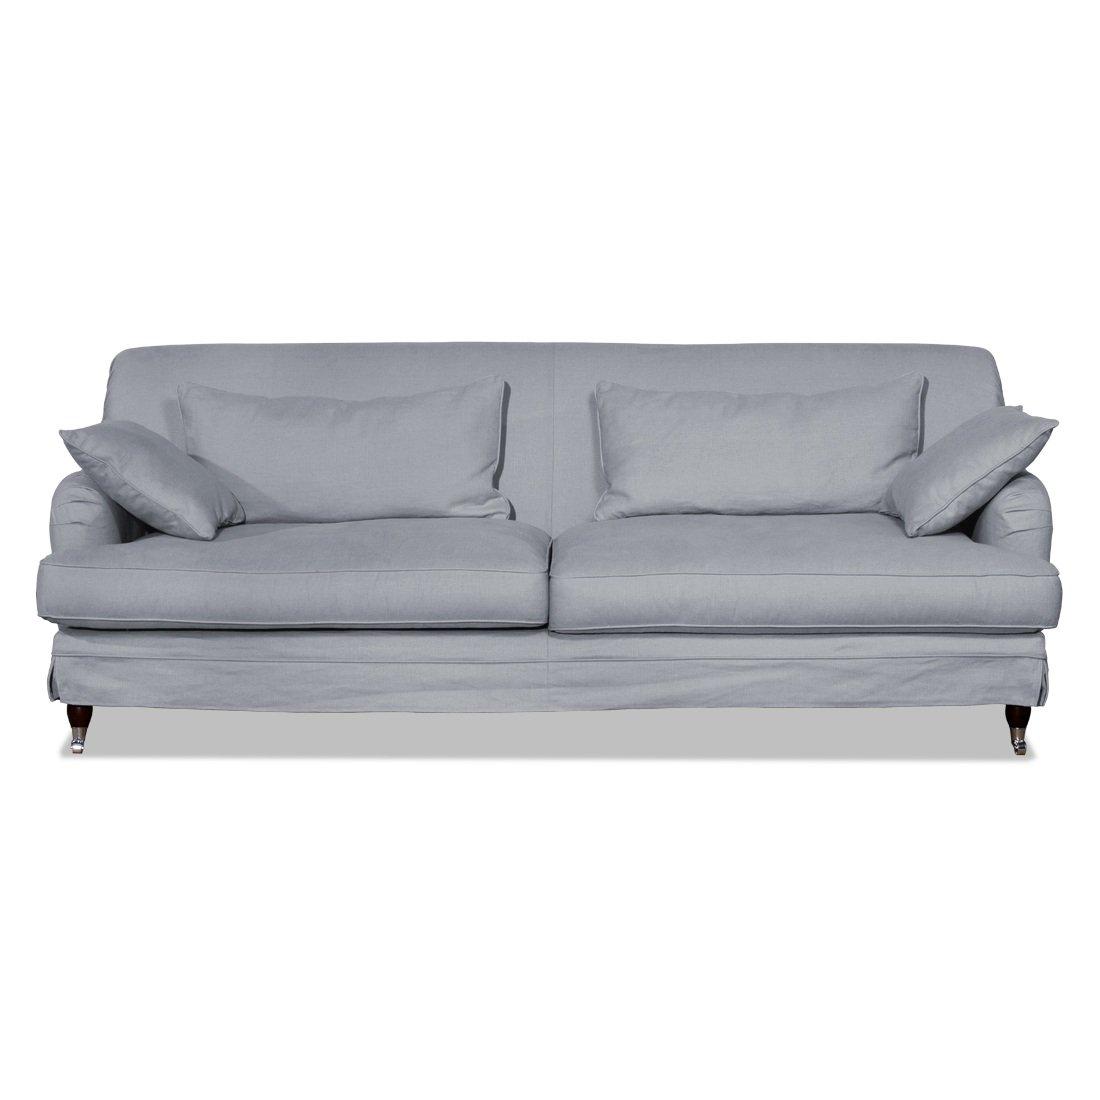 2-Sitzer Sofa Grau-Blau Designer Couch Sofa günstig kaufen